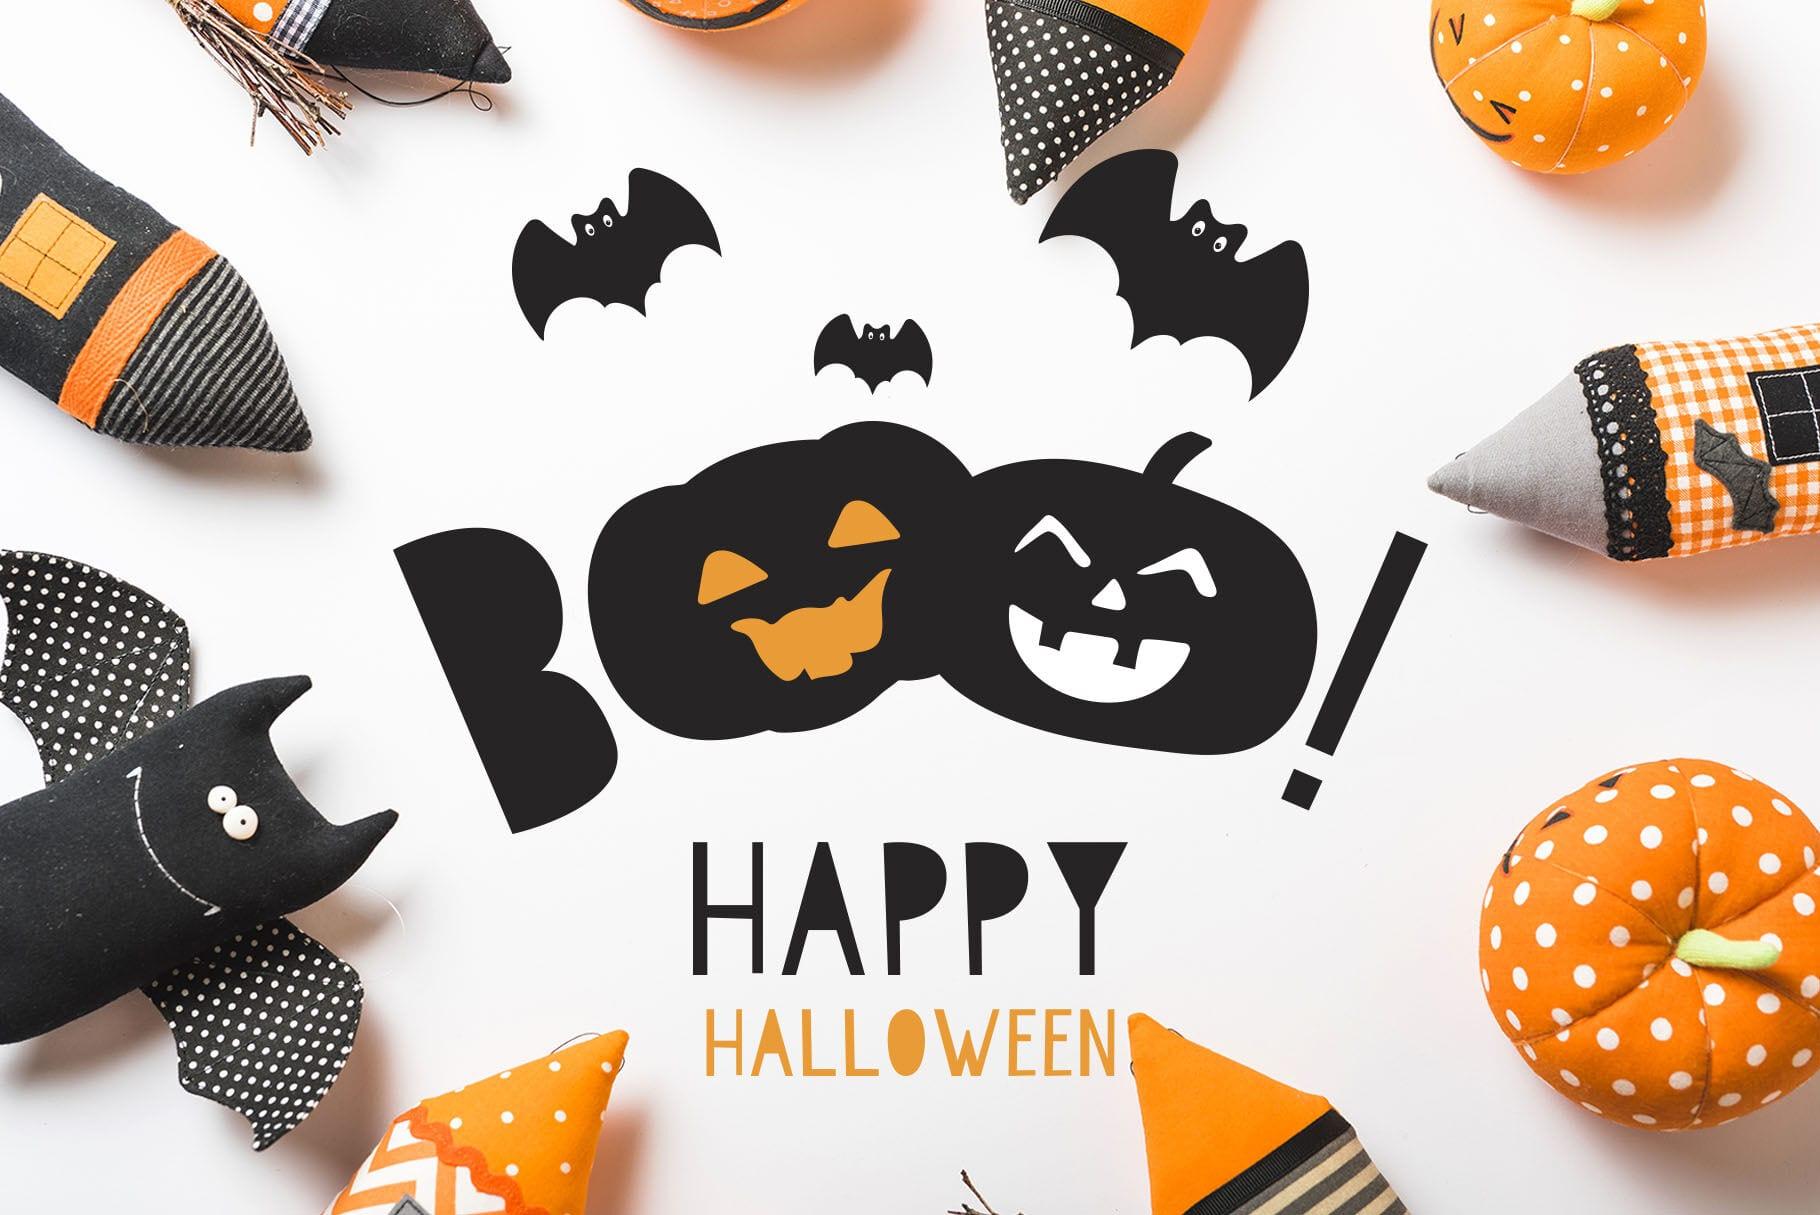 cover 29 - Stiahnite si Halloween set prvkov